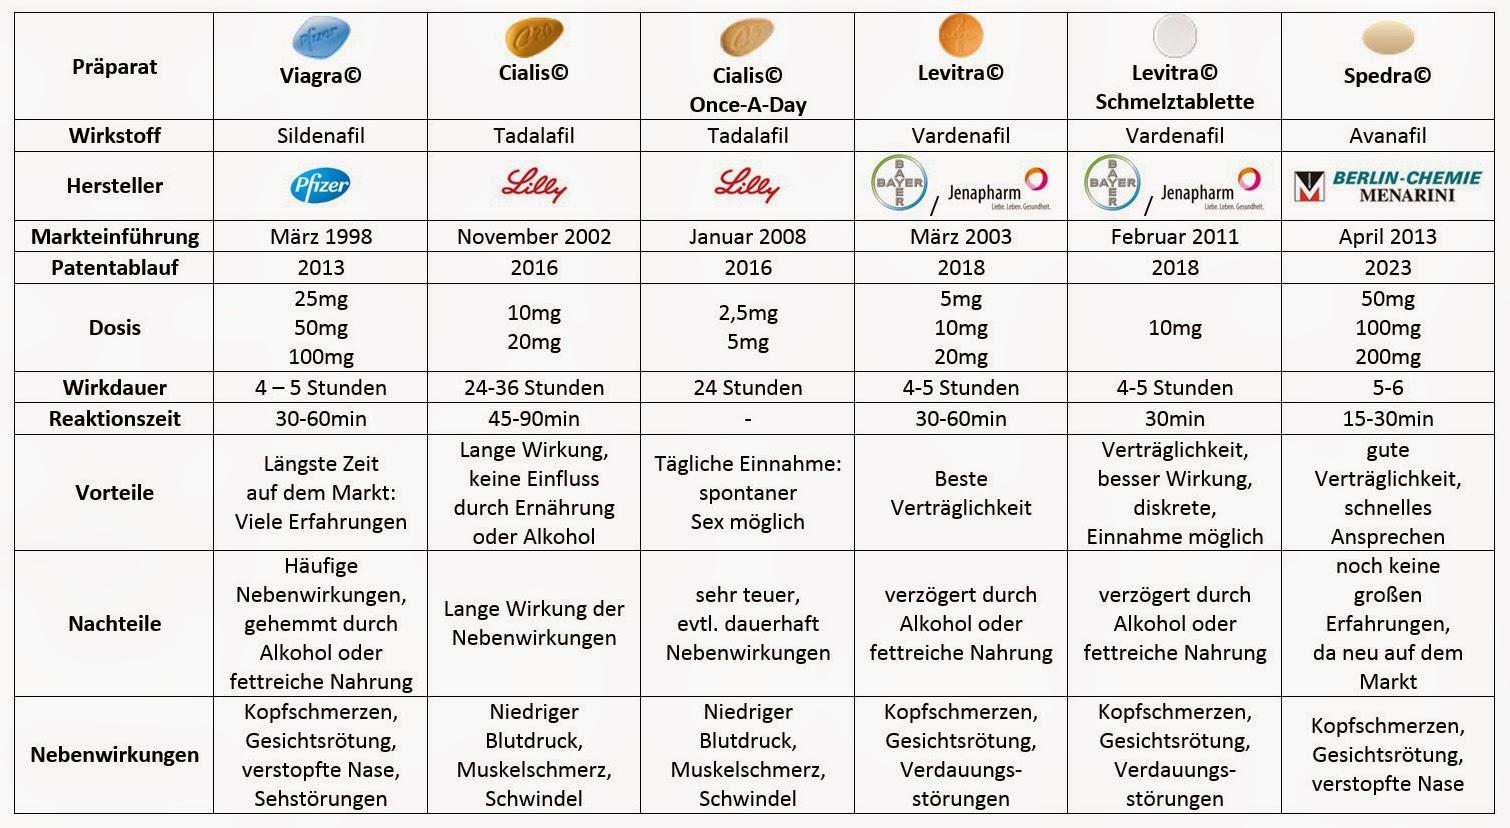 penisgröße tabelle